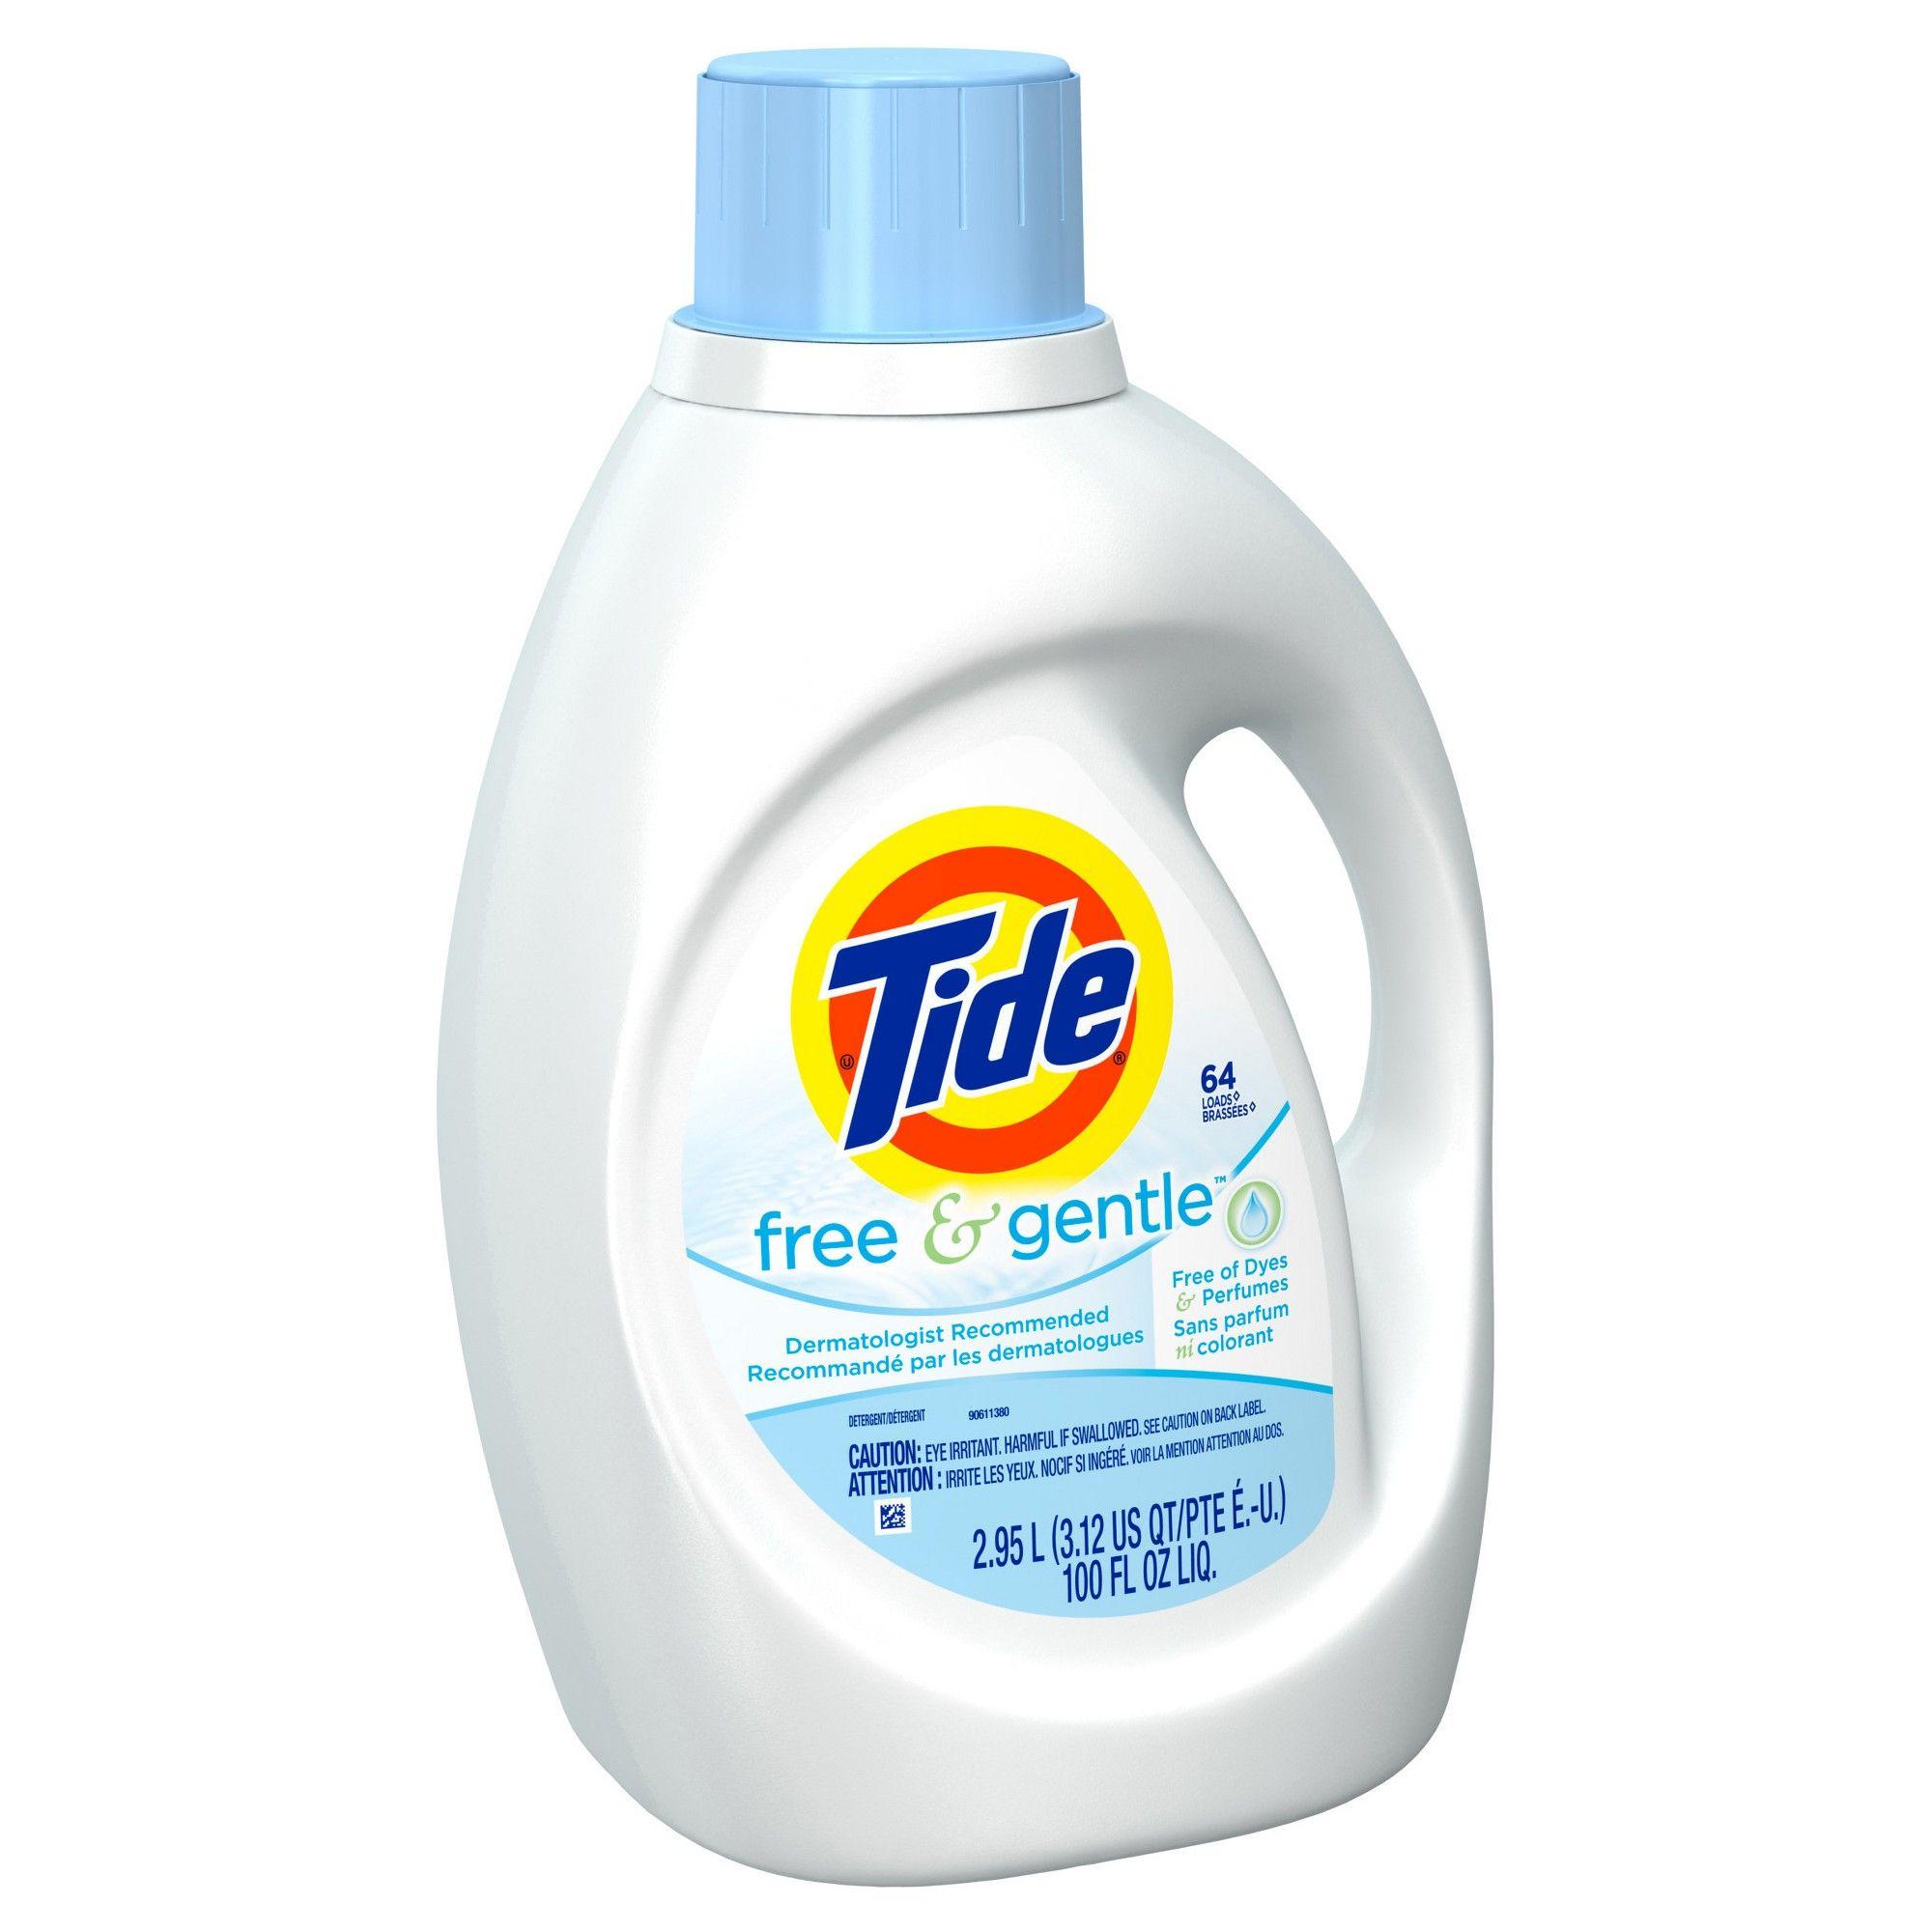 Tide Free Liquid Laundry Detergent 92 Fl Oz Laundry Liquid